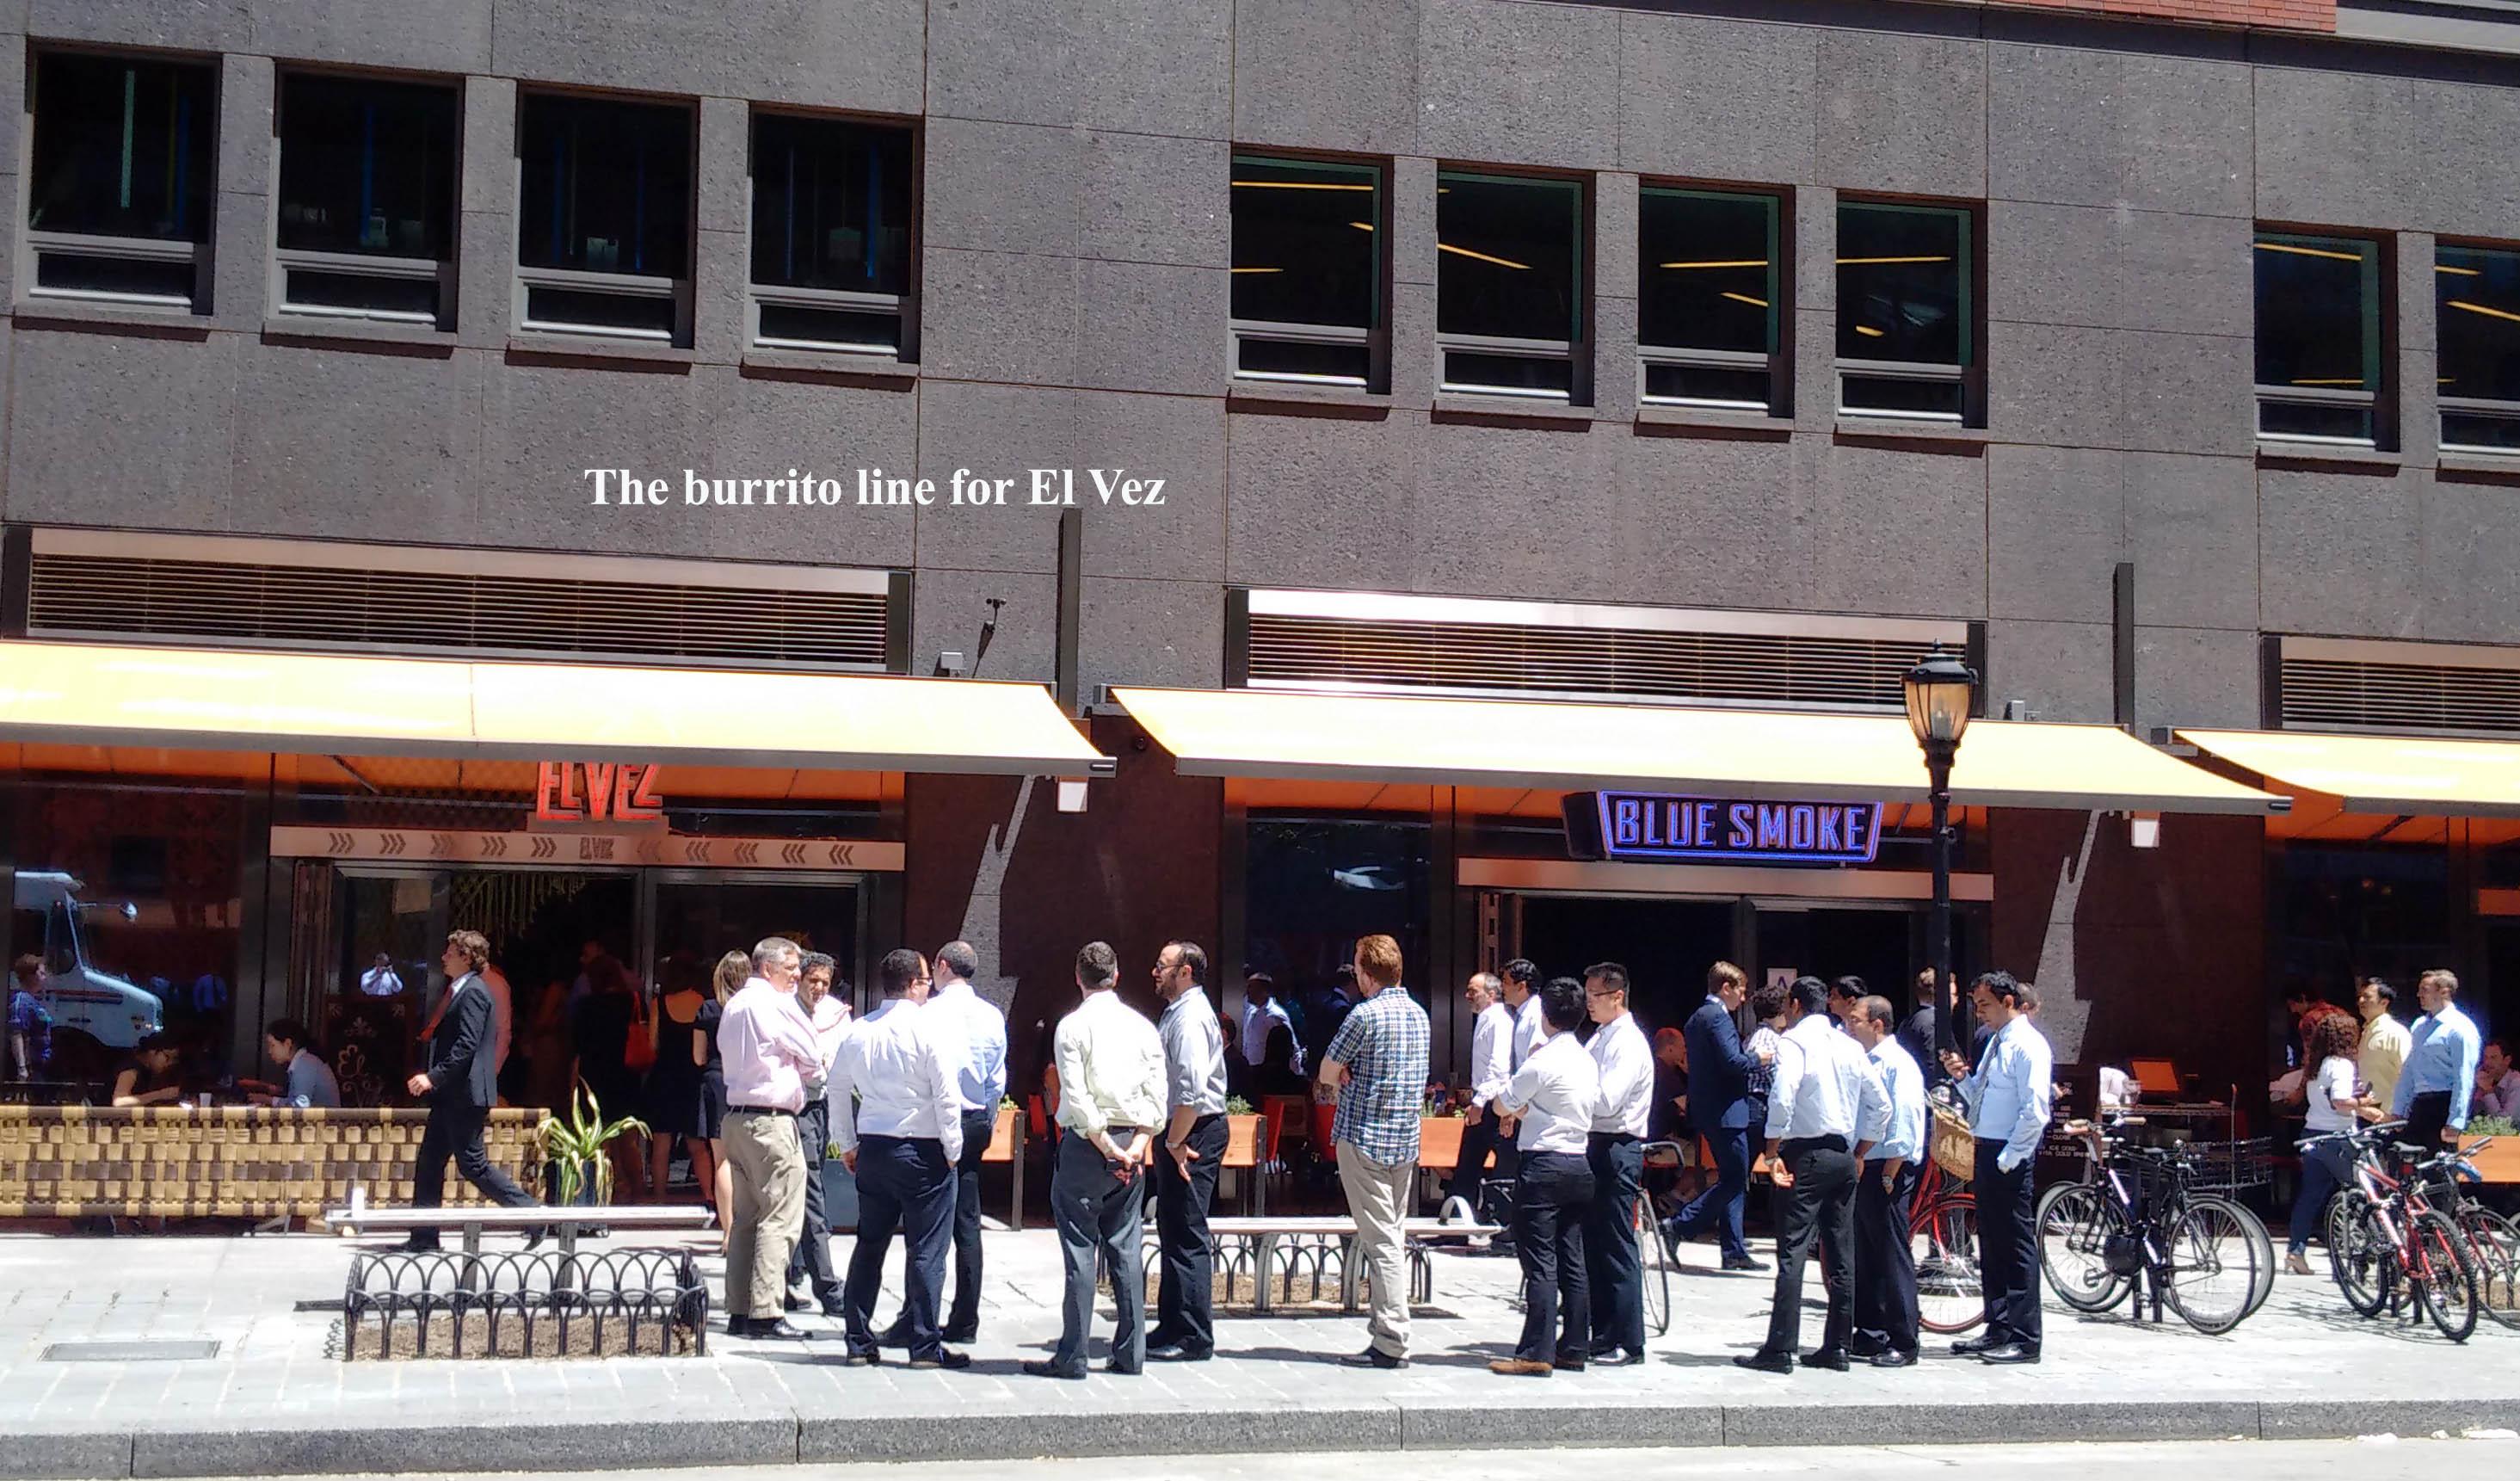 burrito line for el vez